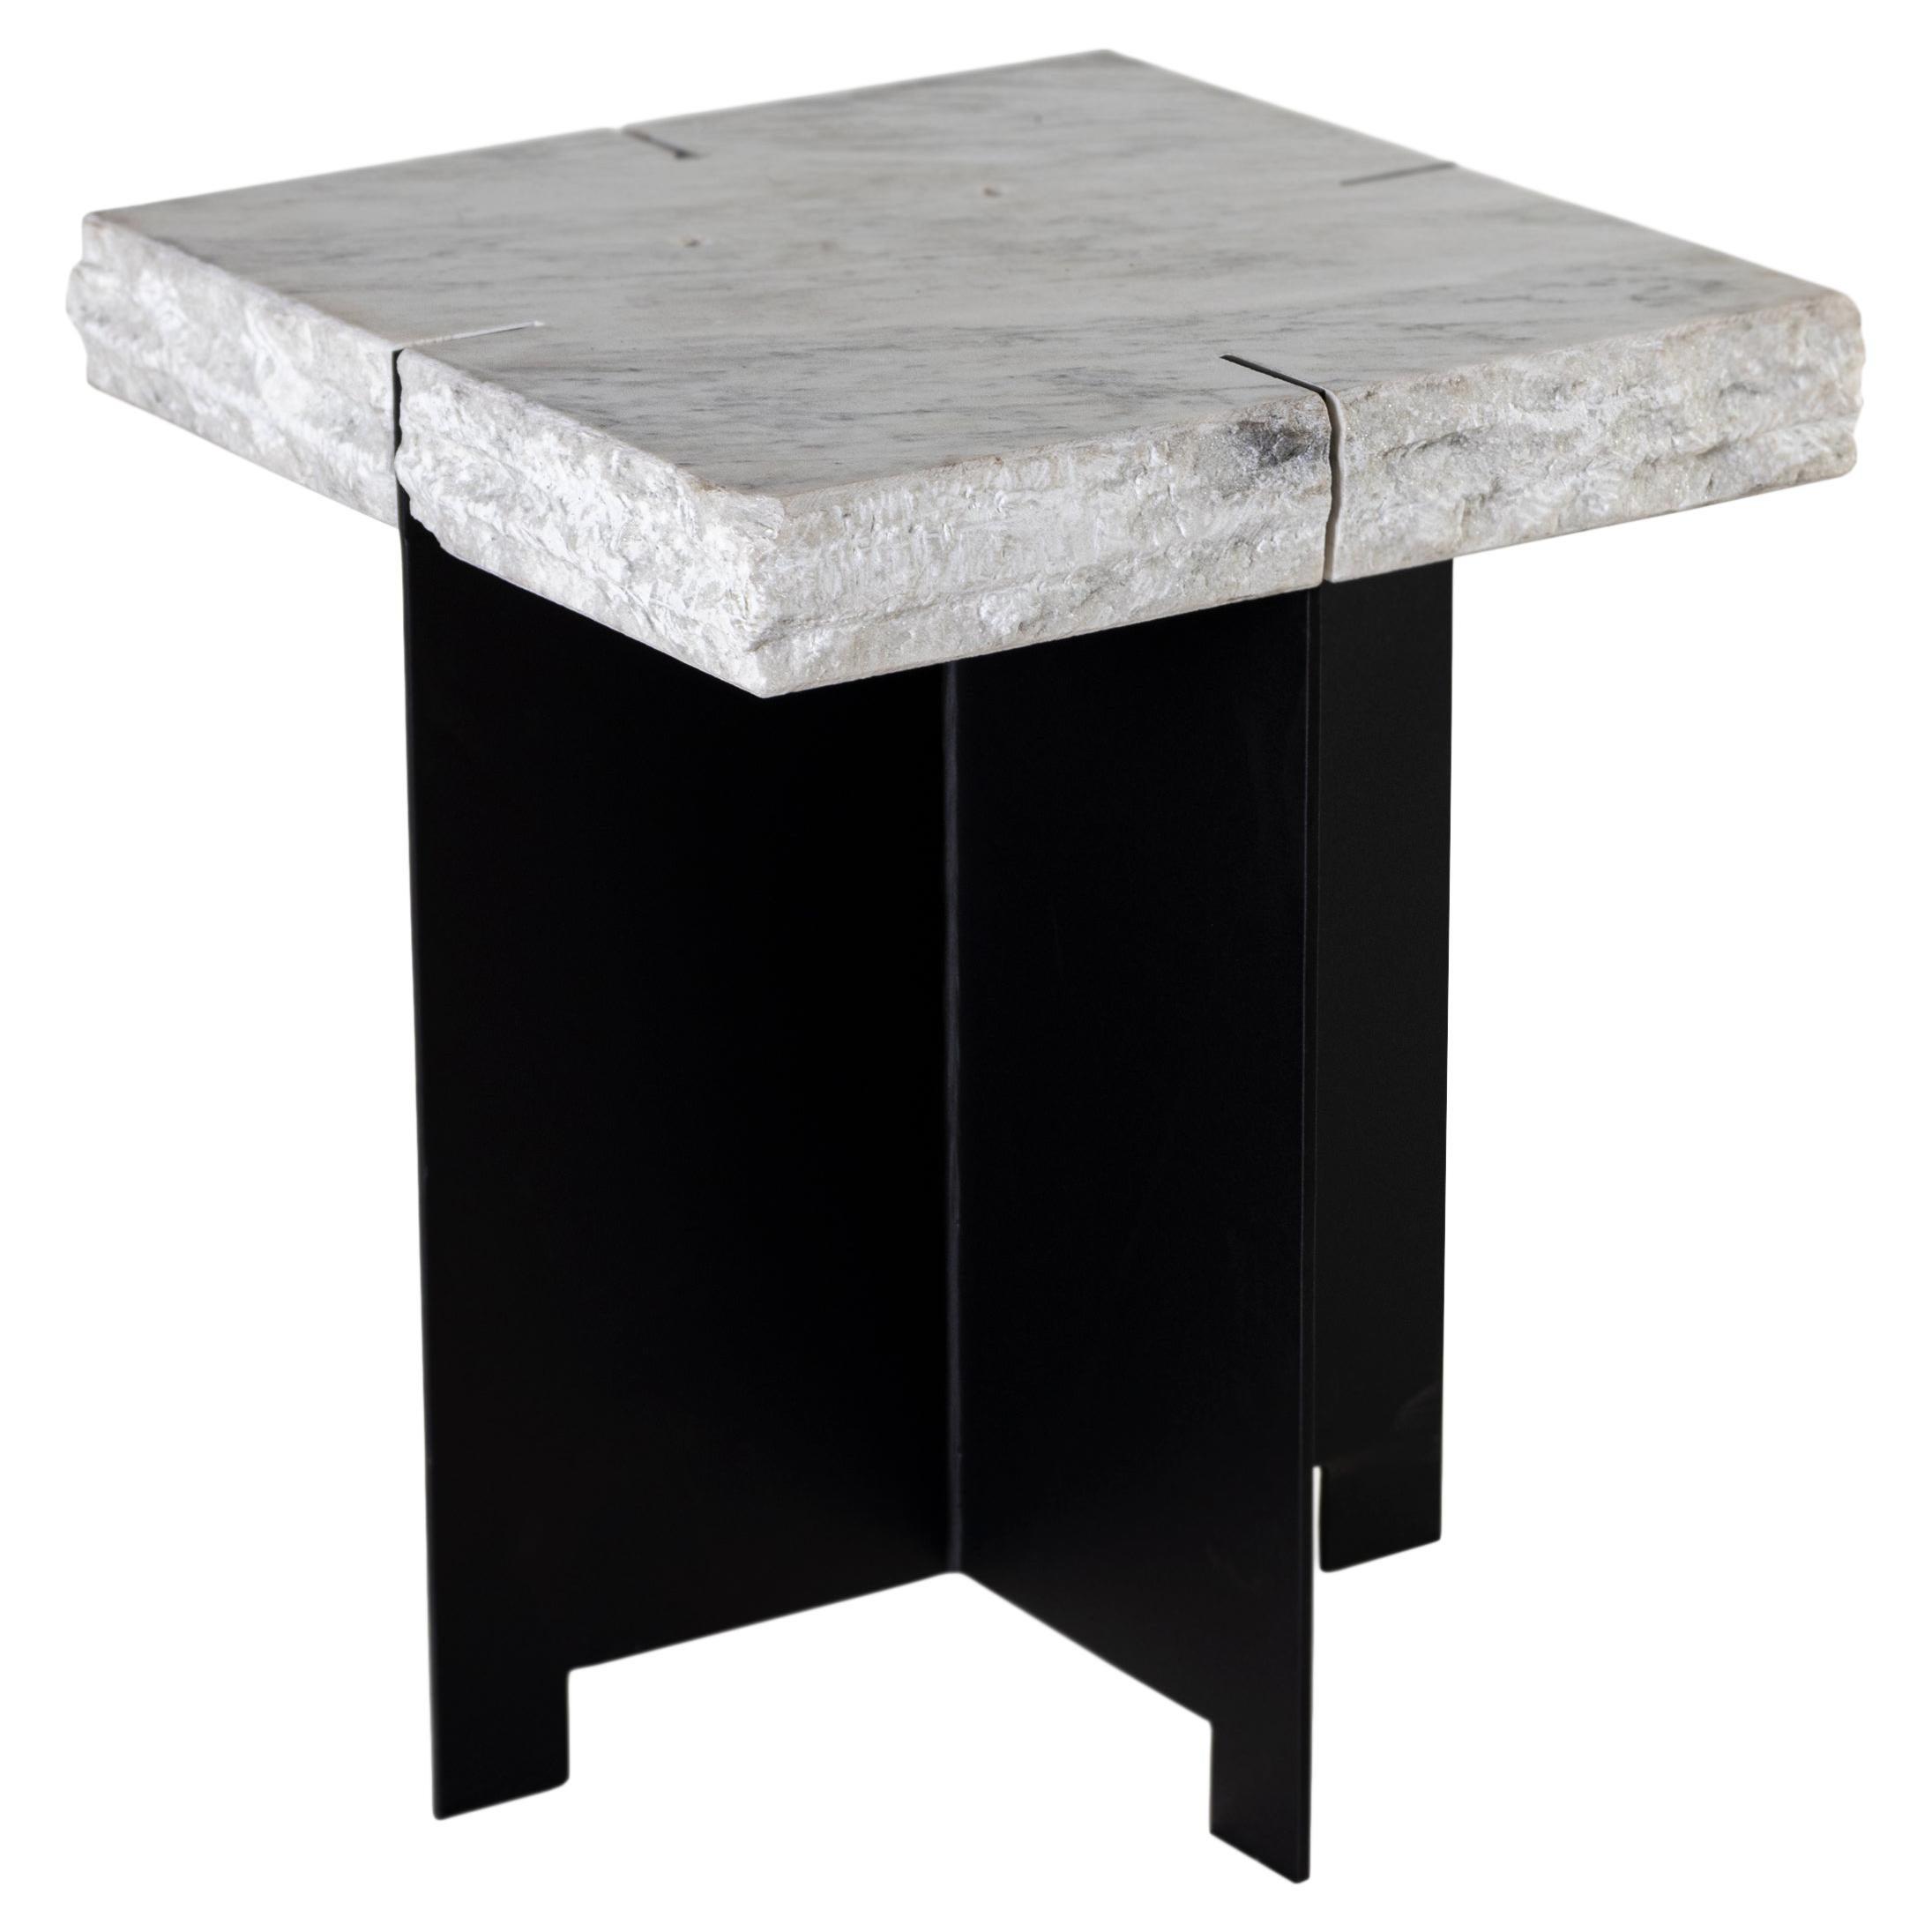 Repurposed Marble Side Table on Blackened Steel Mount